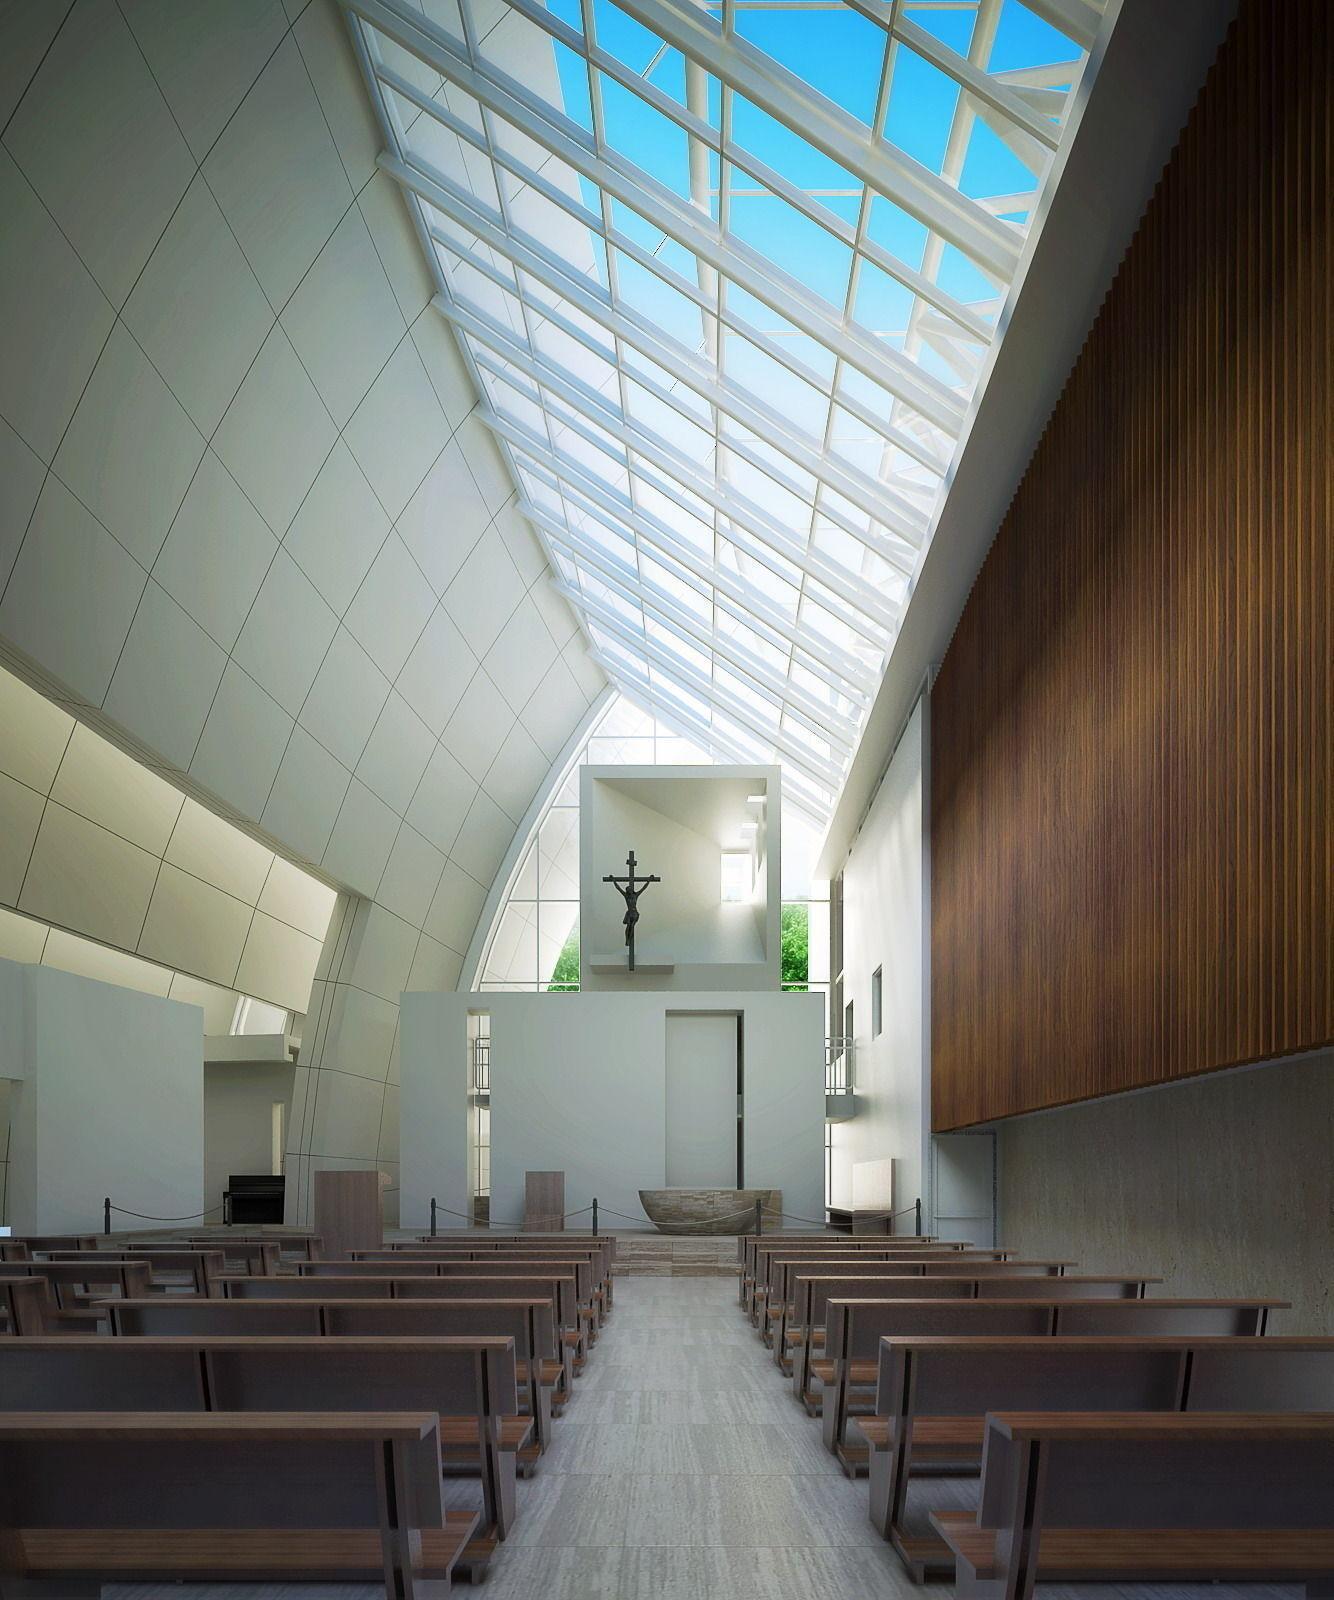 church interior with skylight 3d model max fbx tga 1 ...